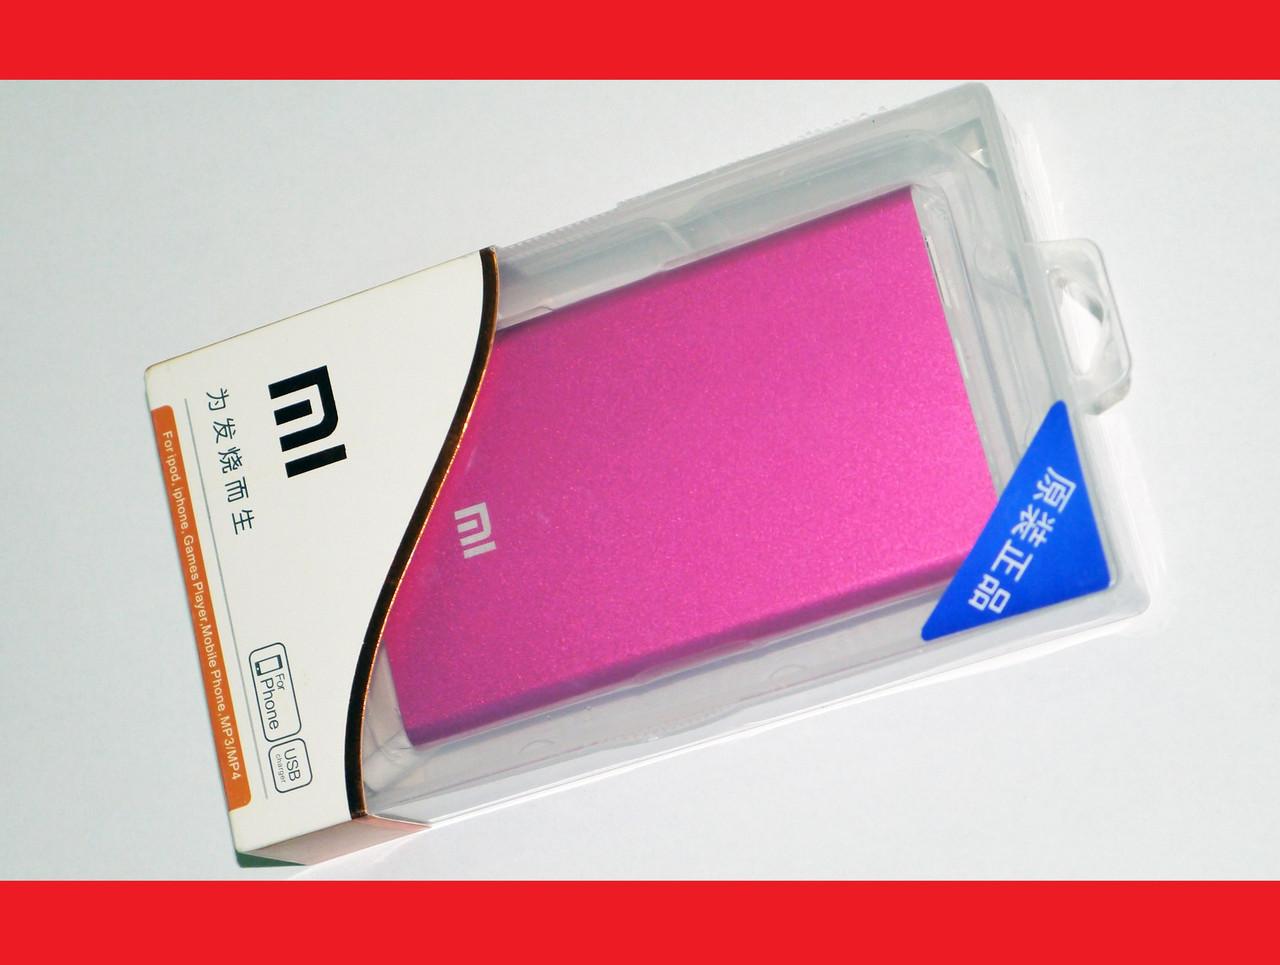 Power Bank Xiaomi Mi 24000 mAh Розовый USB + Металл